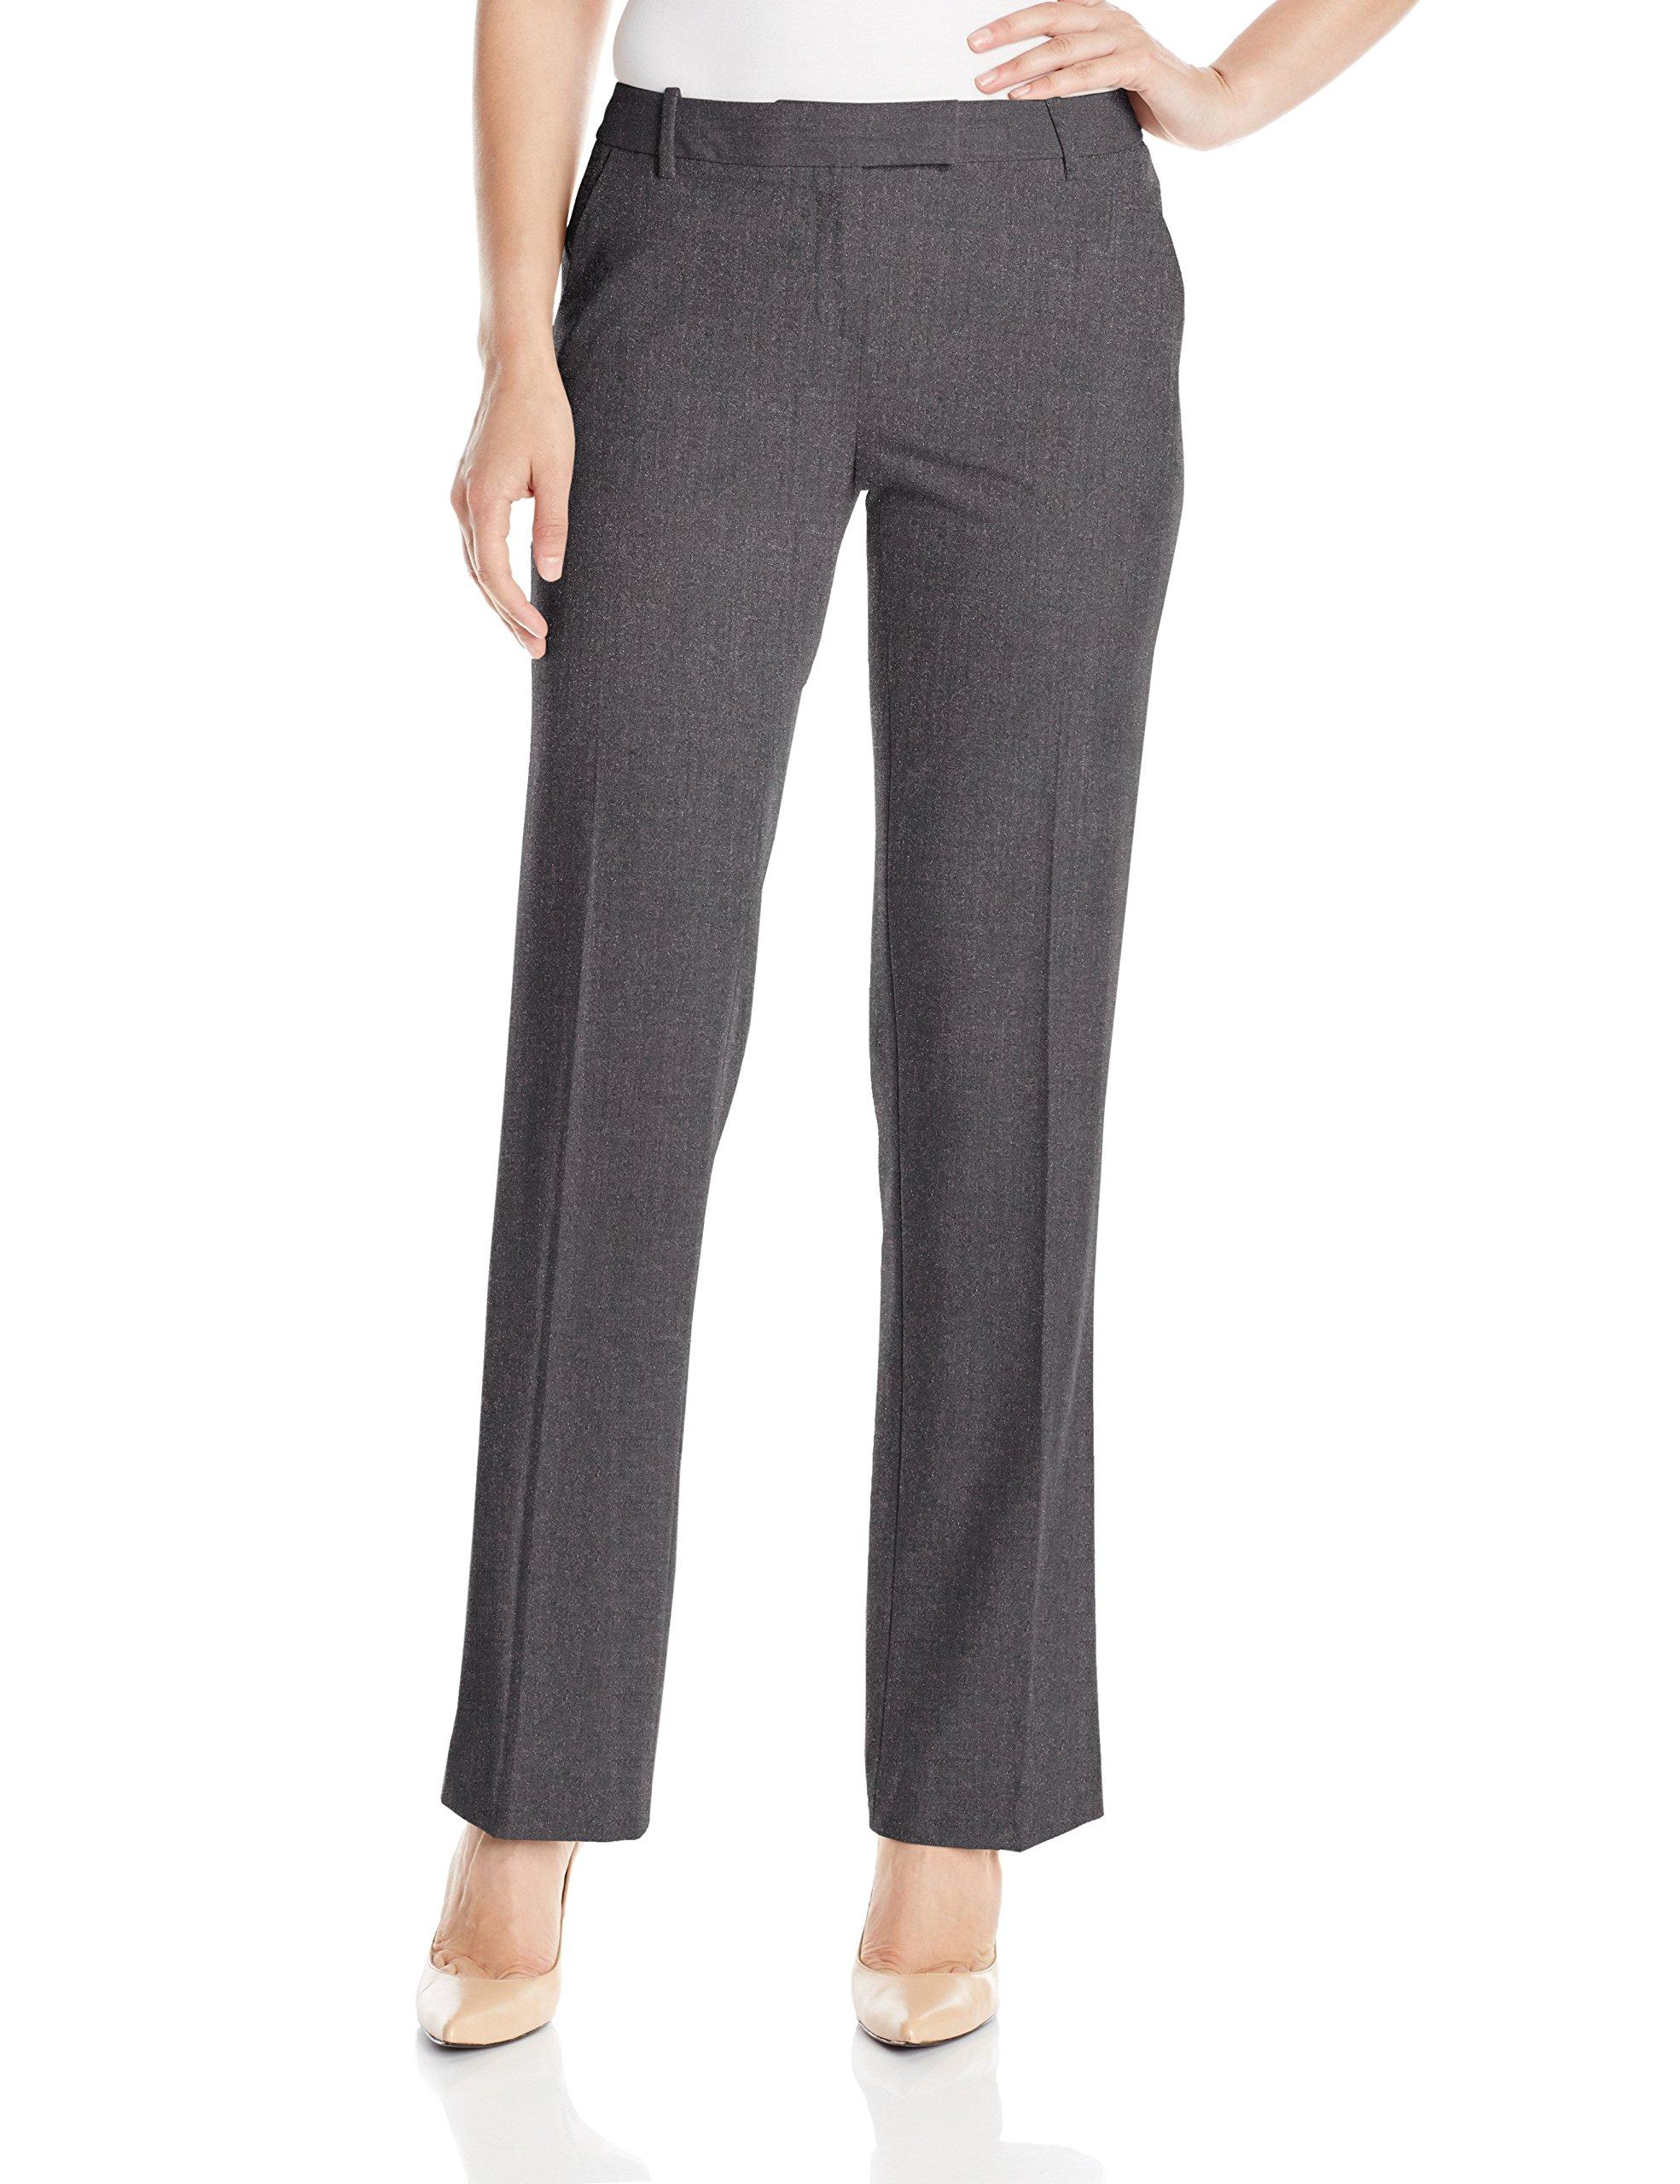 Calvin Klein Women's Madison Pant,Charcoal Melange,2 by Calvin Klein (Image #1)